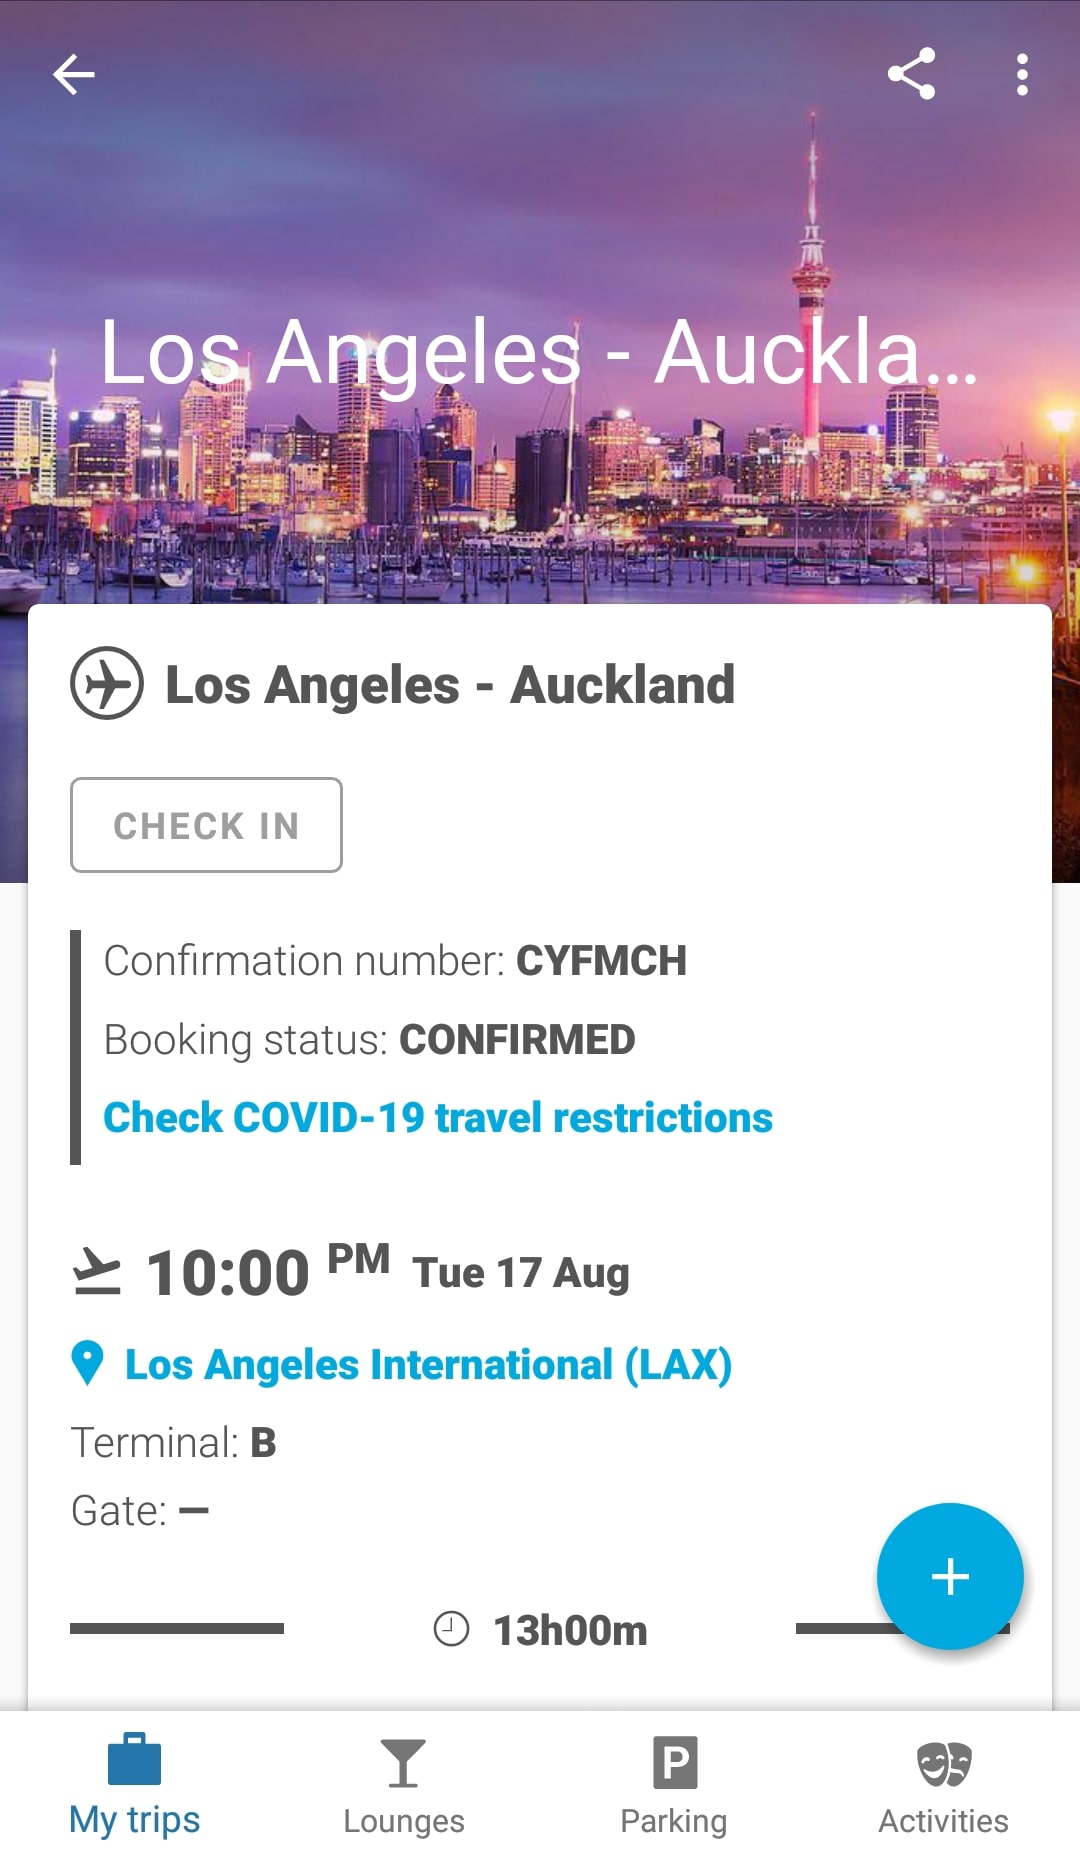 flight-reservation-status-online